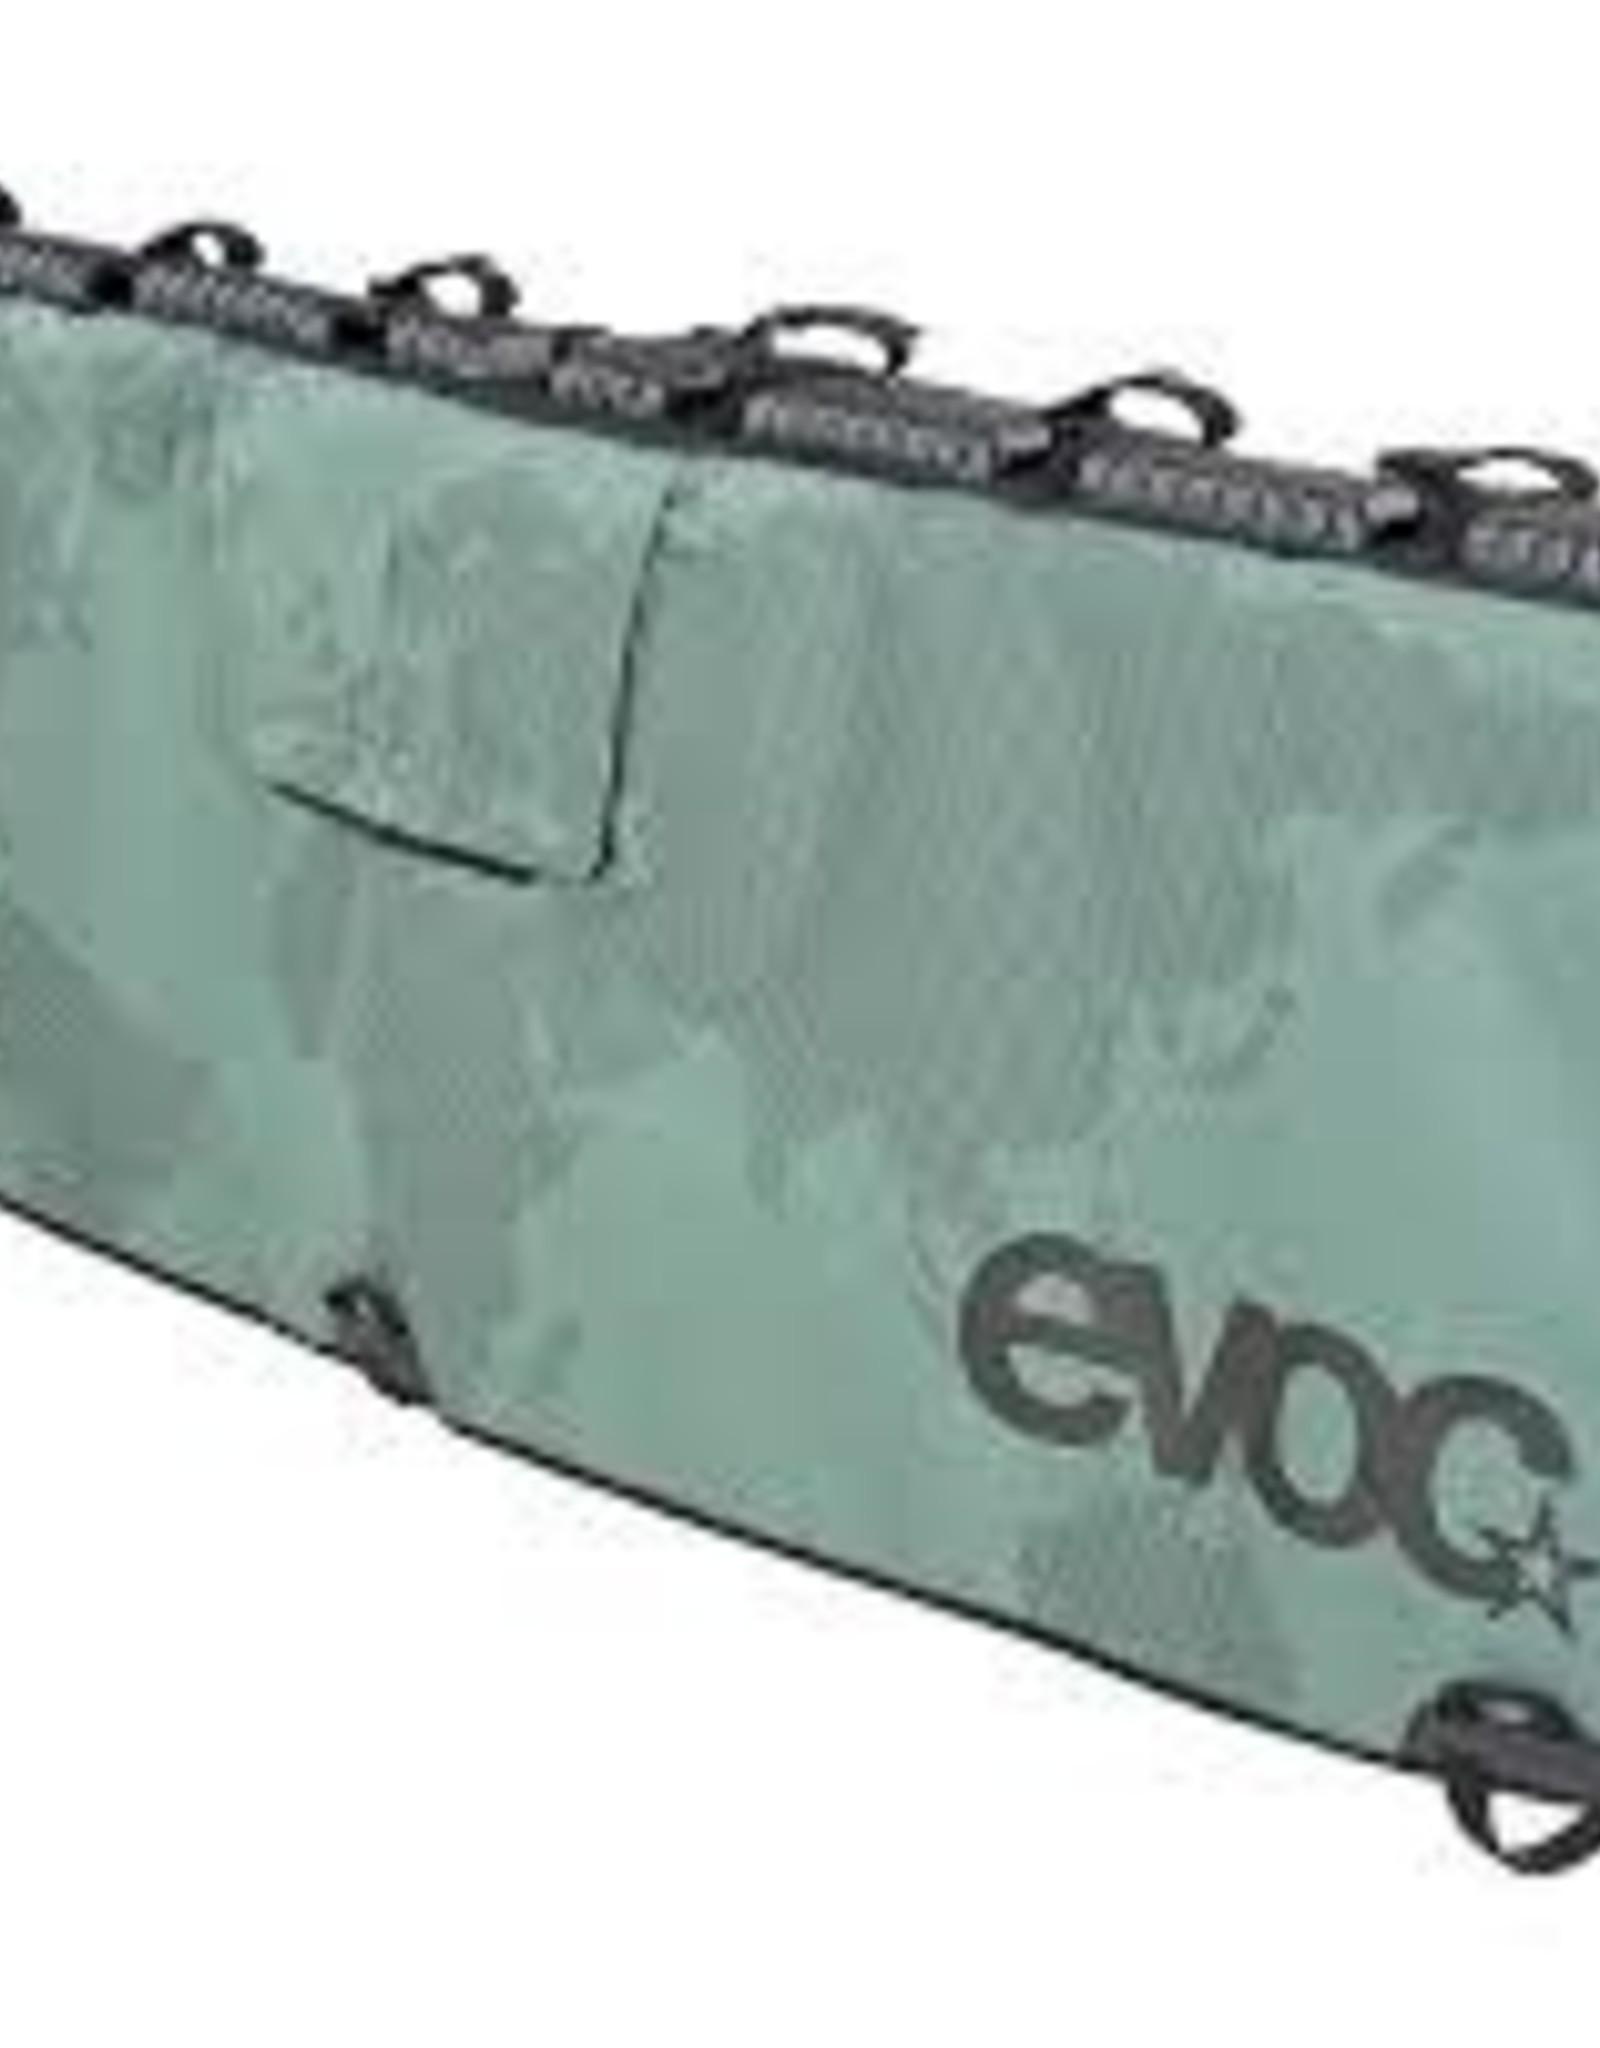 EVOC EVOC, Tailgate Pad, 160cm / 63'' wide, for full-sized trucks, Olive